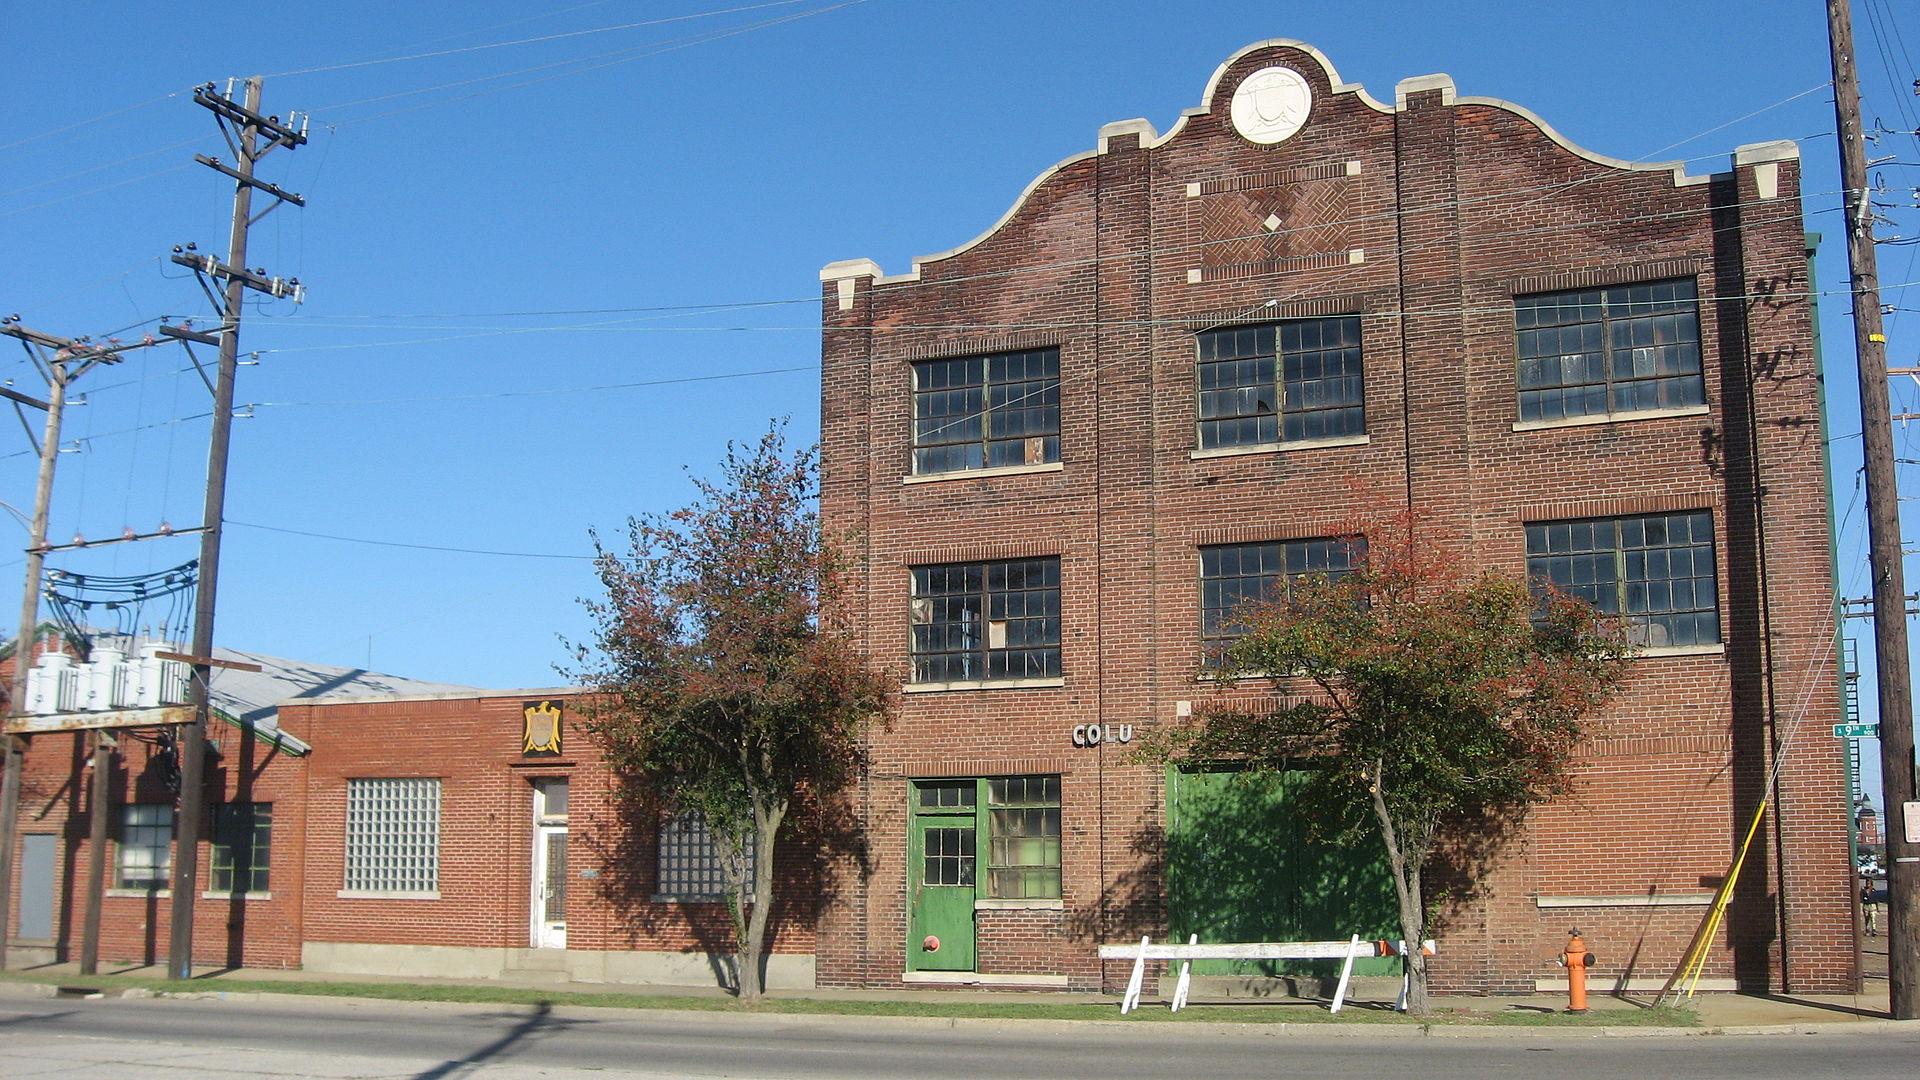 The Harig, Koop, and Company - Columbia Mantel Company Building